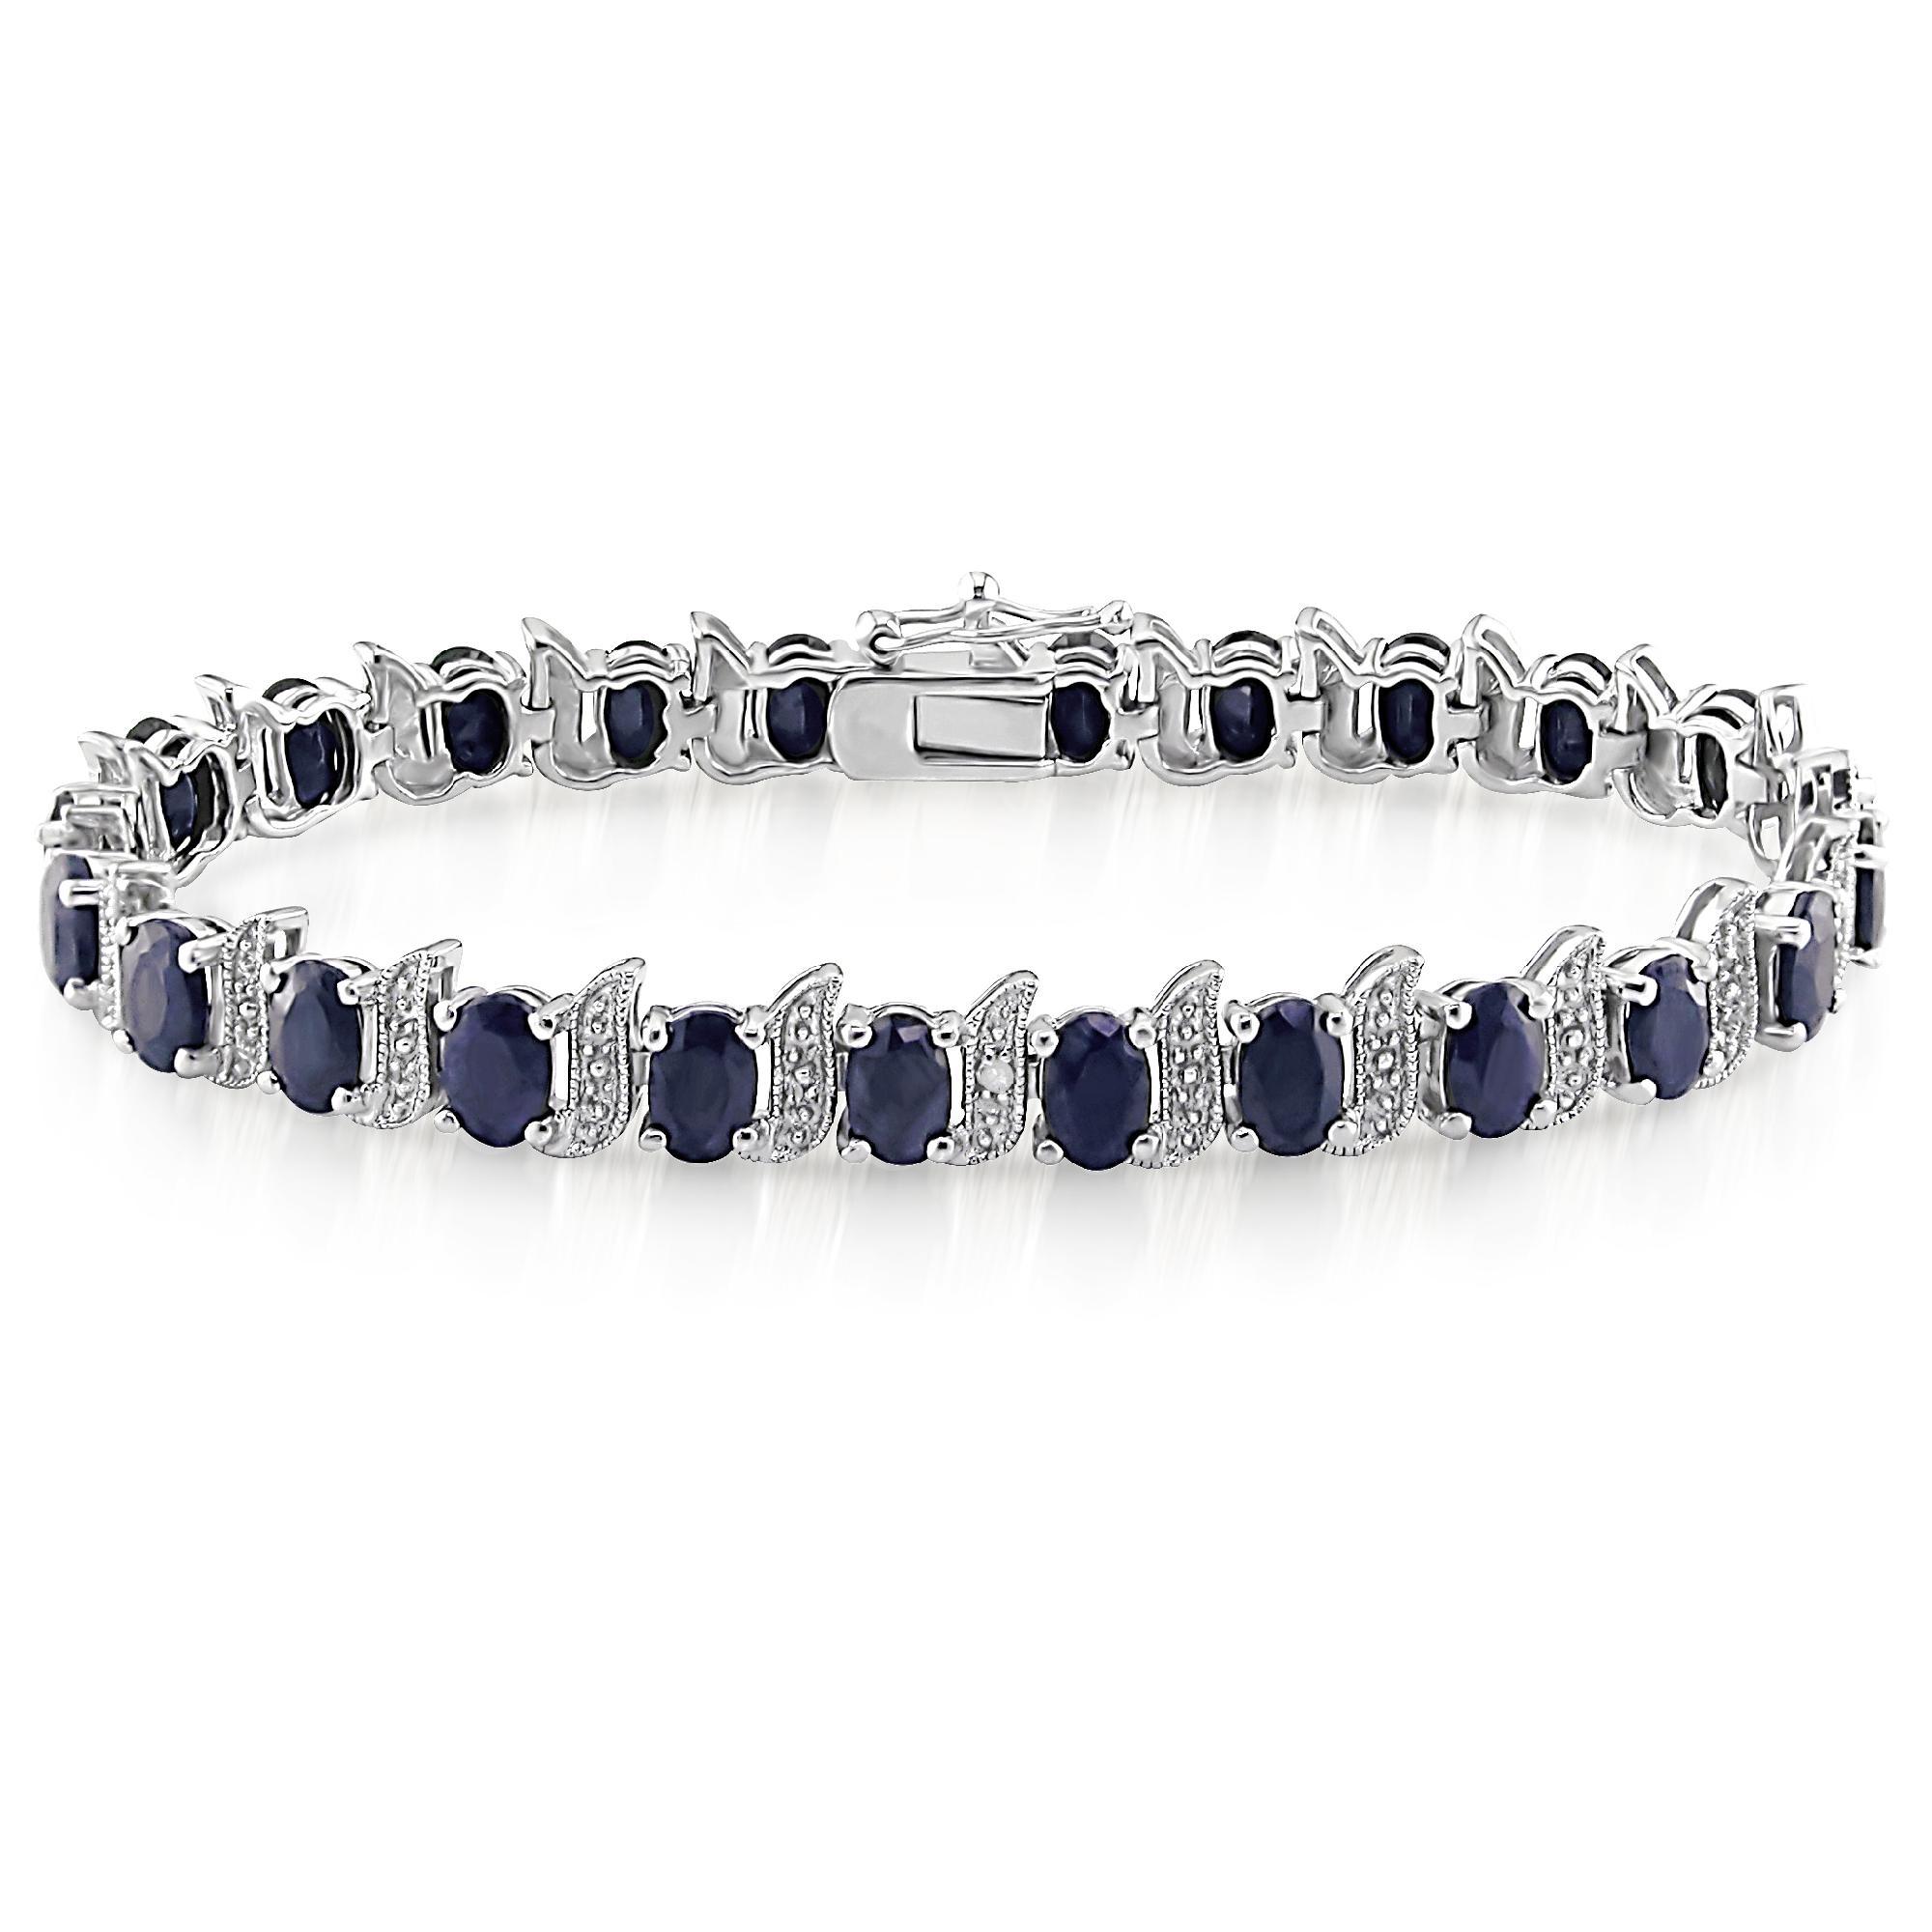 Sterling Silver 14.88 CTTW Black Sapphire with 0.03 CTTW Diamond Bracelet